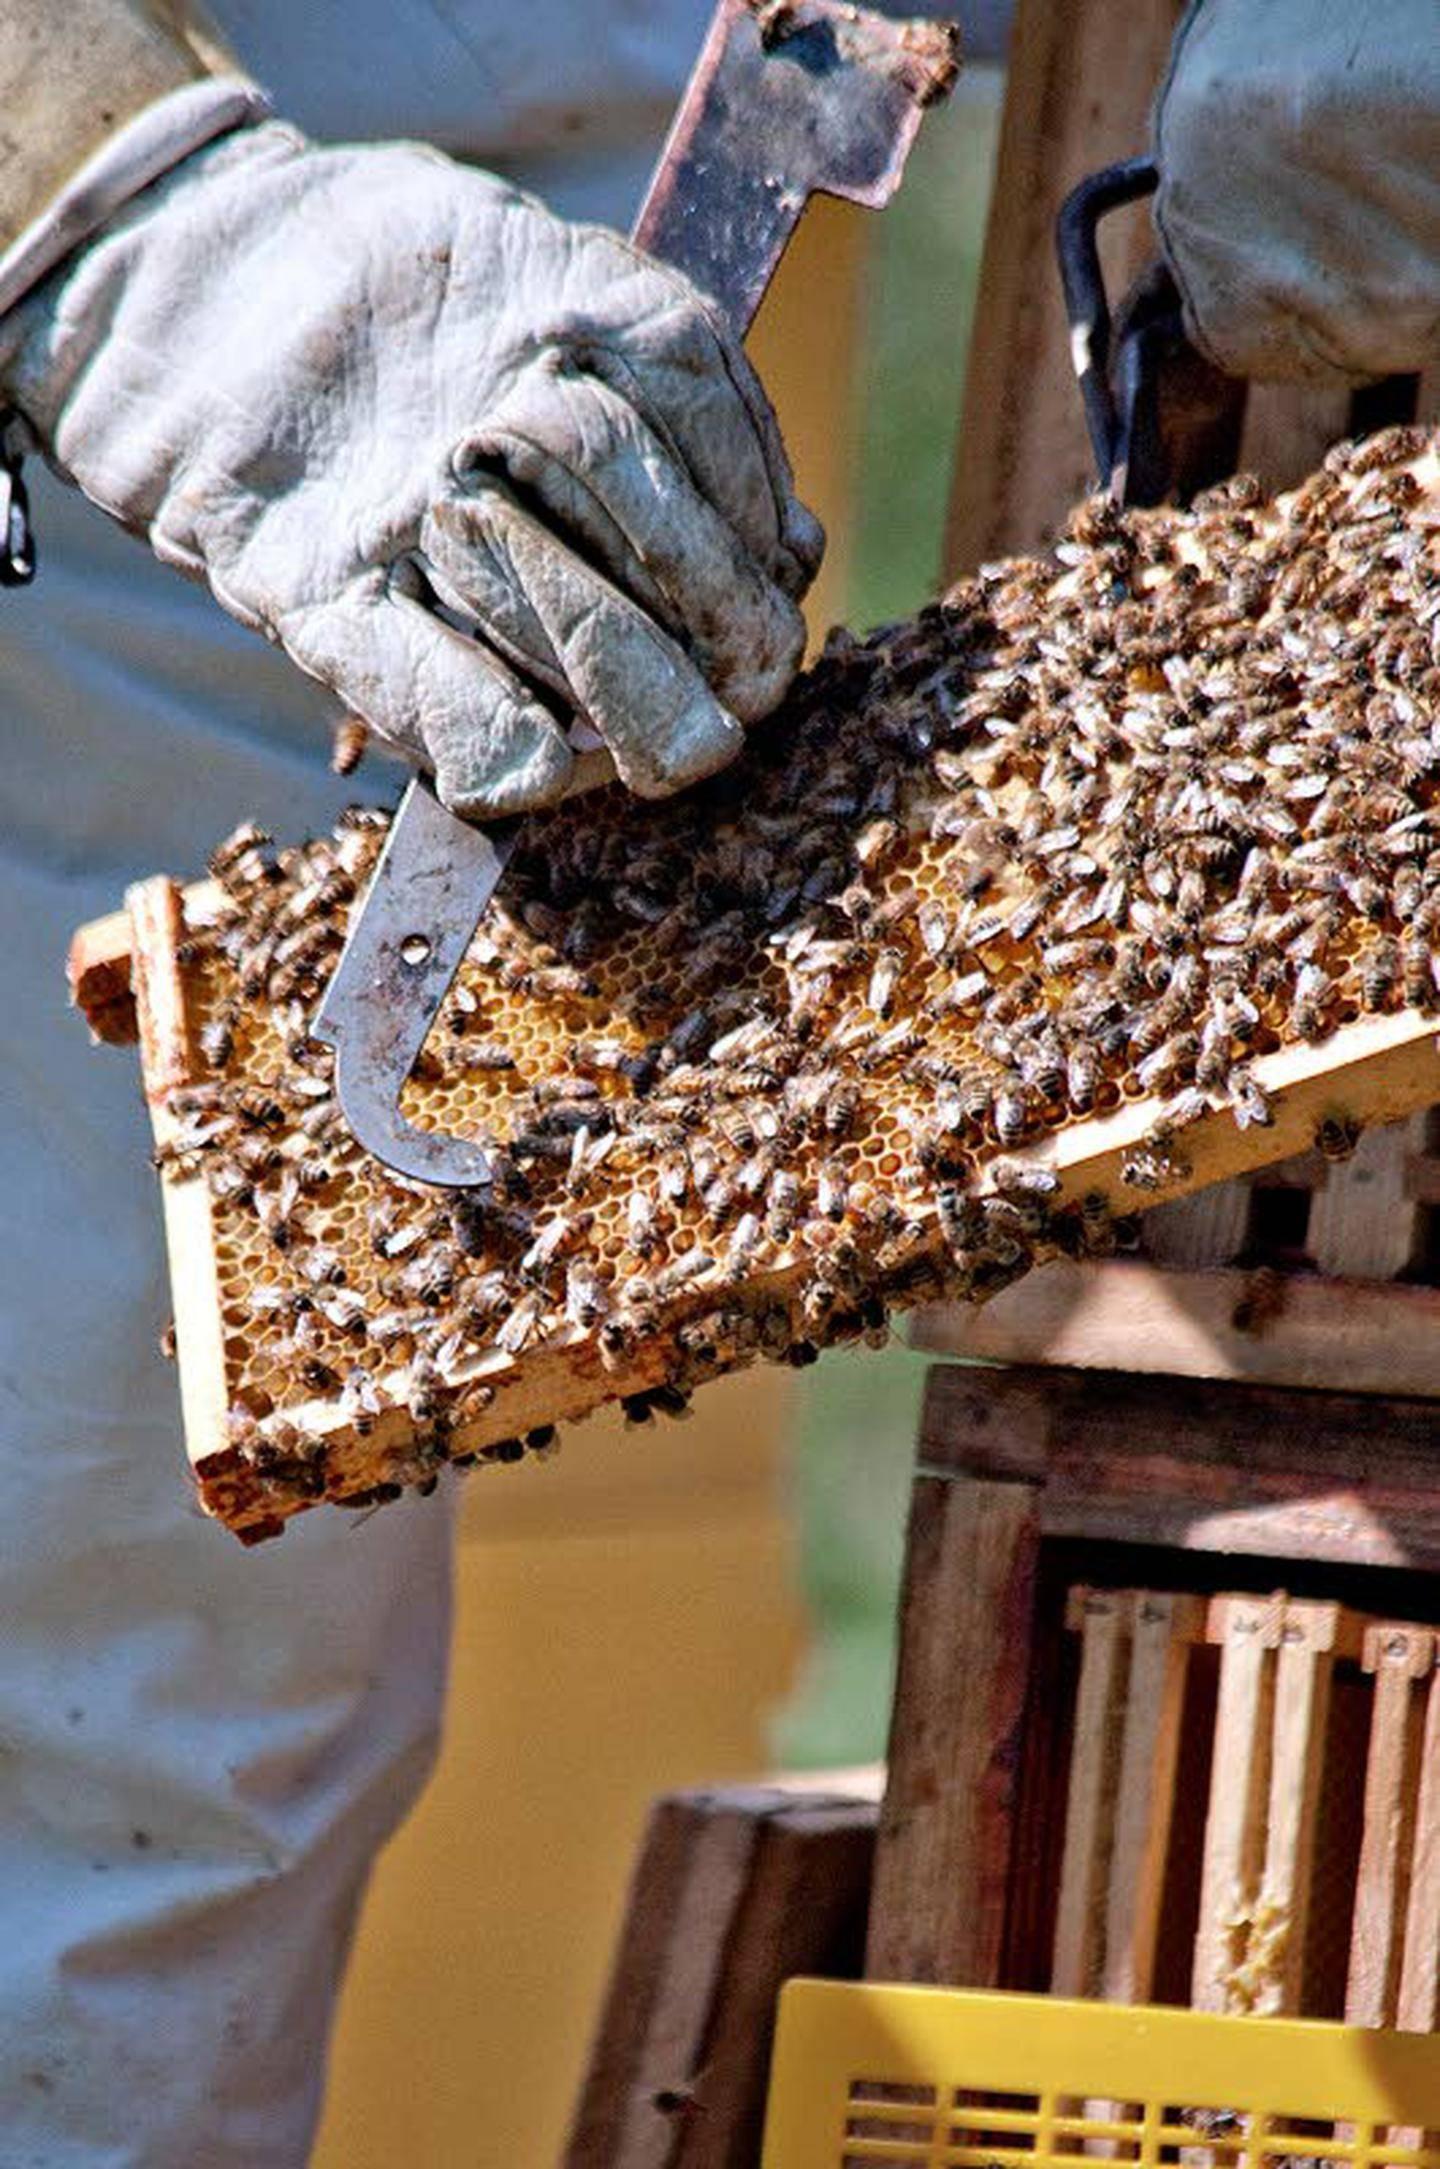 Mehiläisparvi